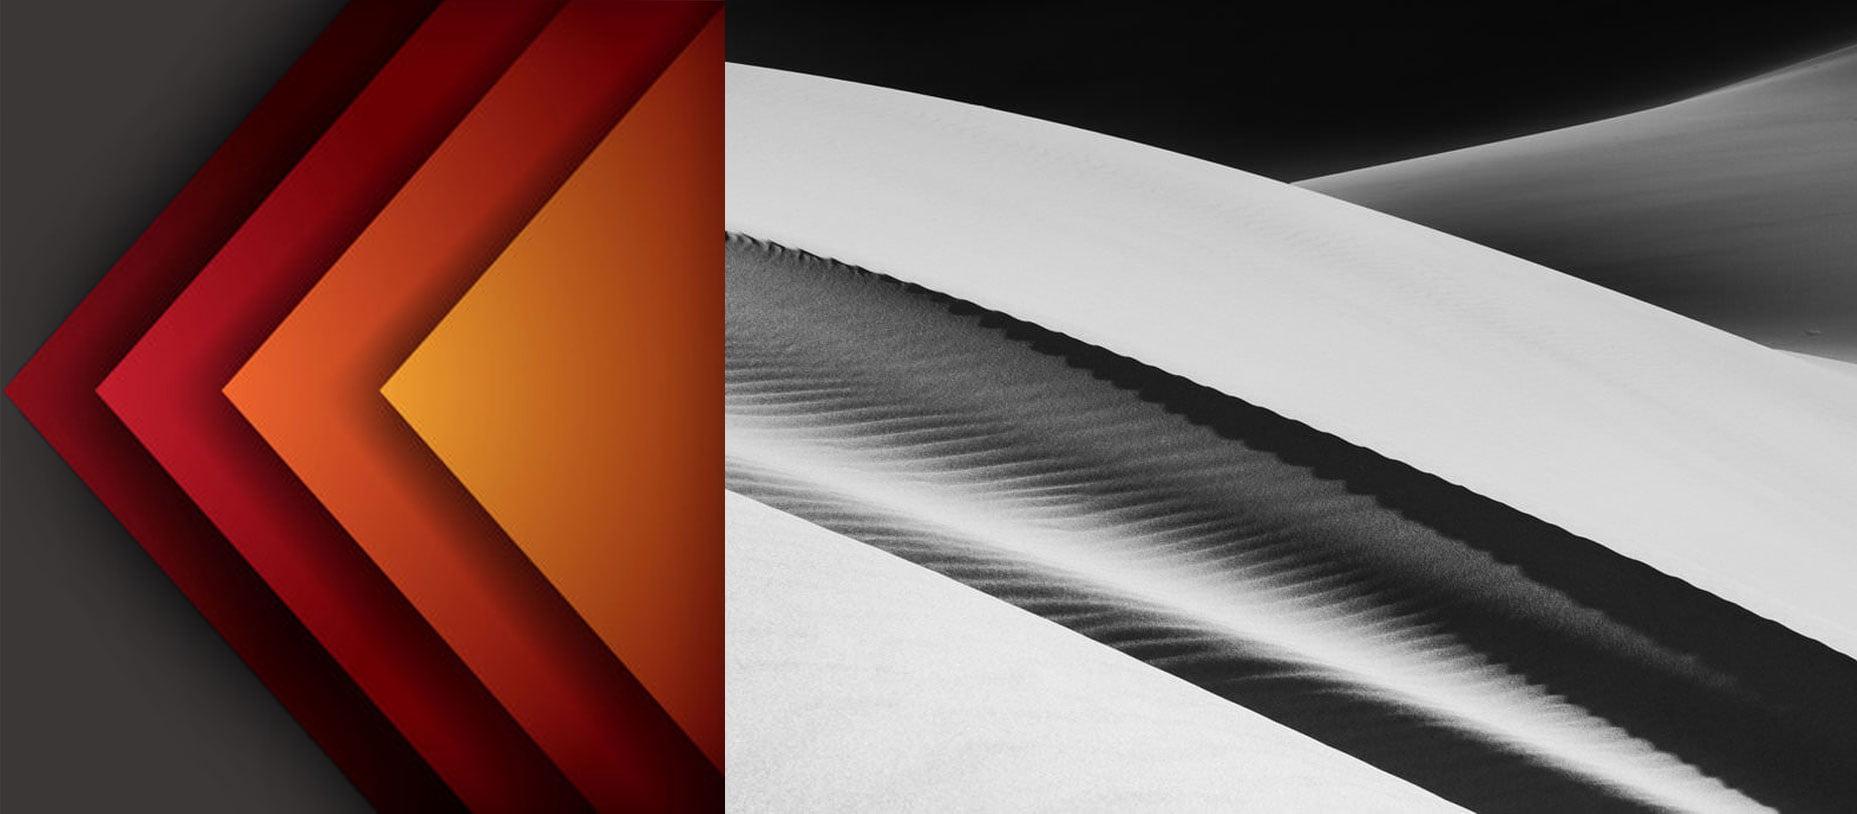 Abstract  Photography17jpg - 35 ایده و راهنما برای عکاسی انتراعی